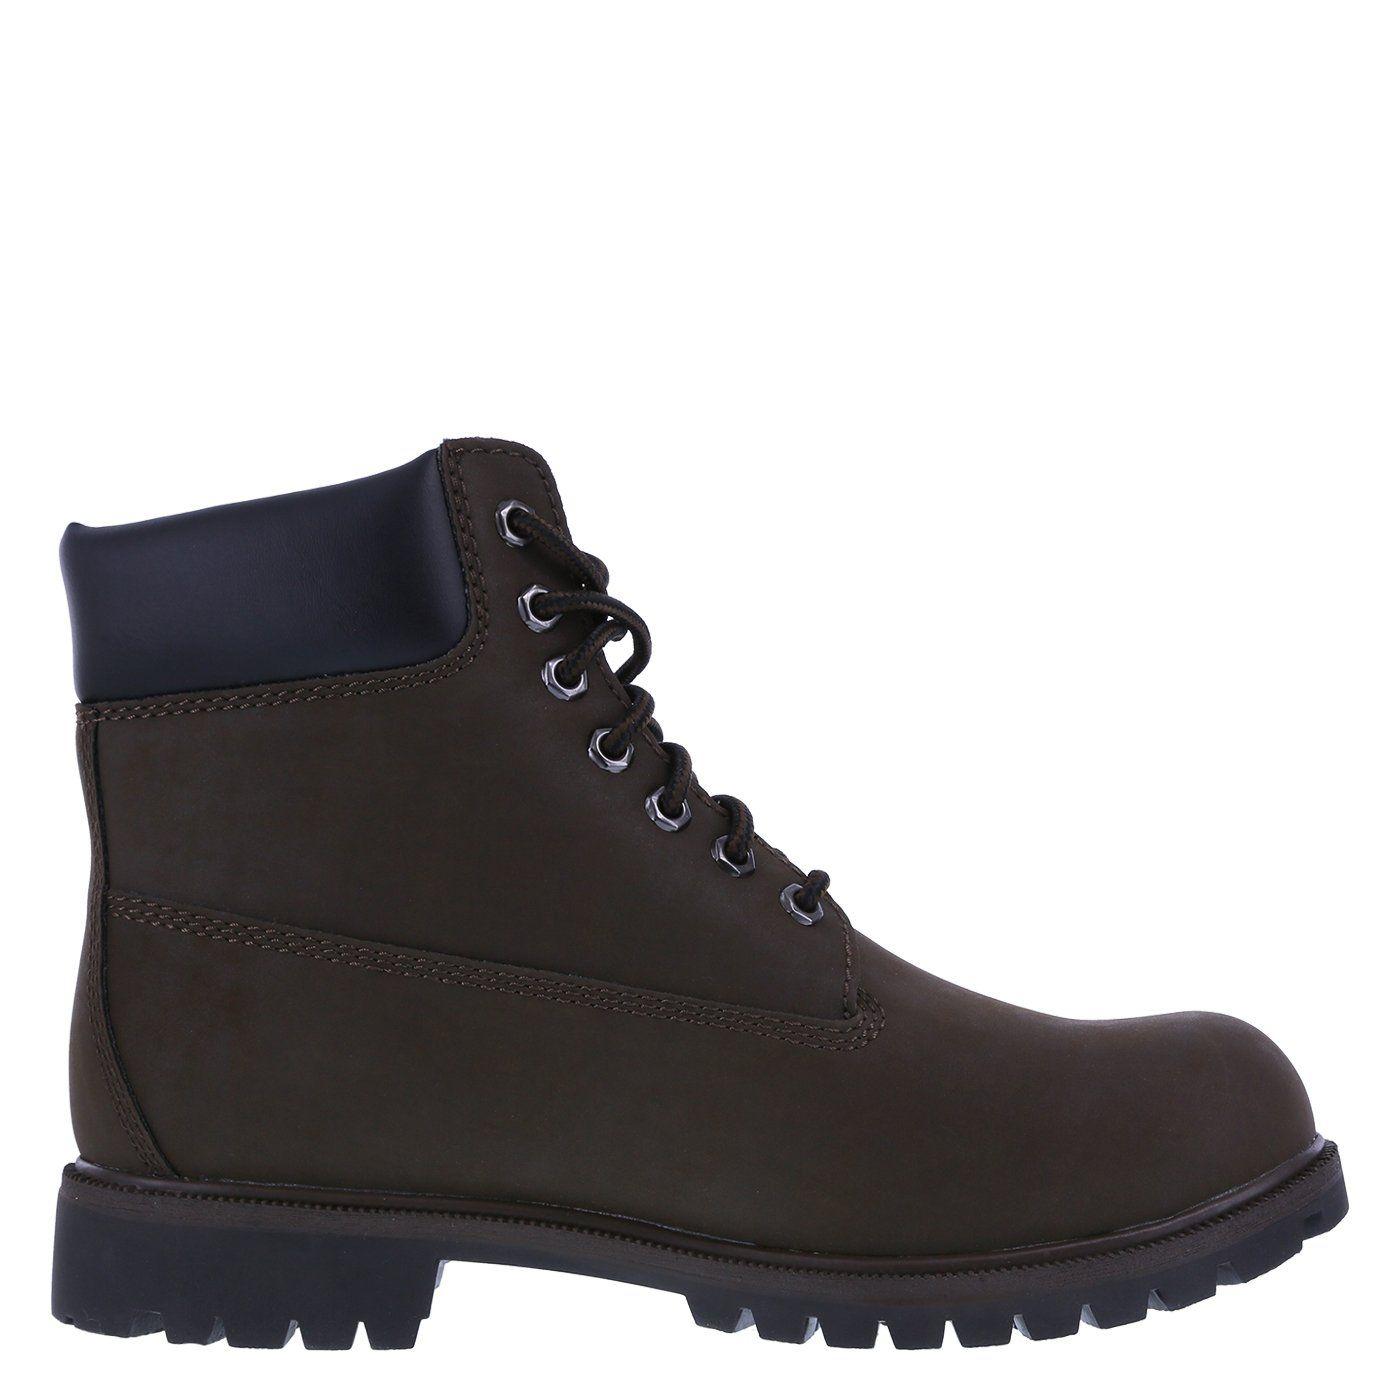 Dexter mens brown mens inch cheyenne boot regular hope you